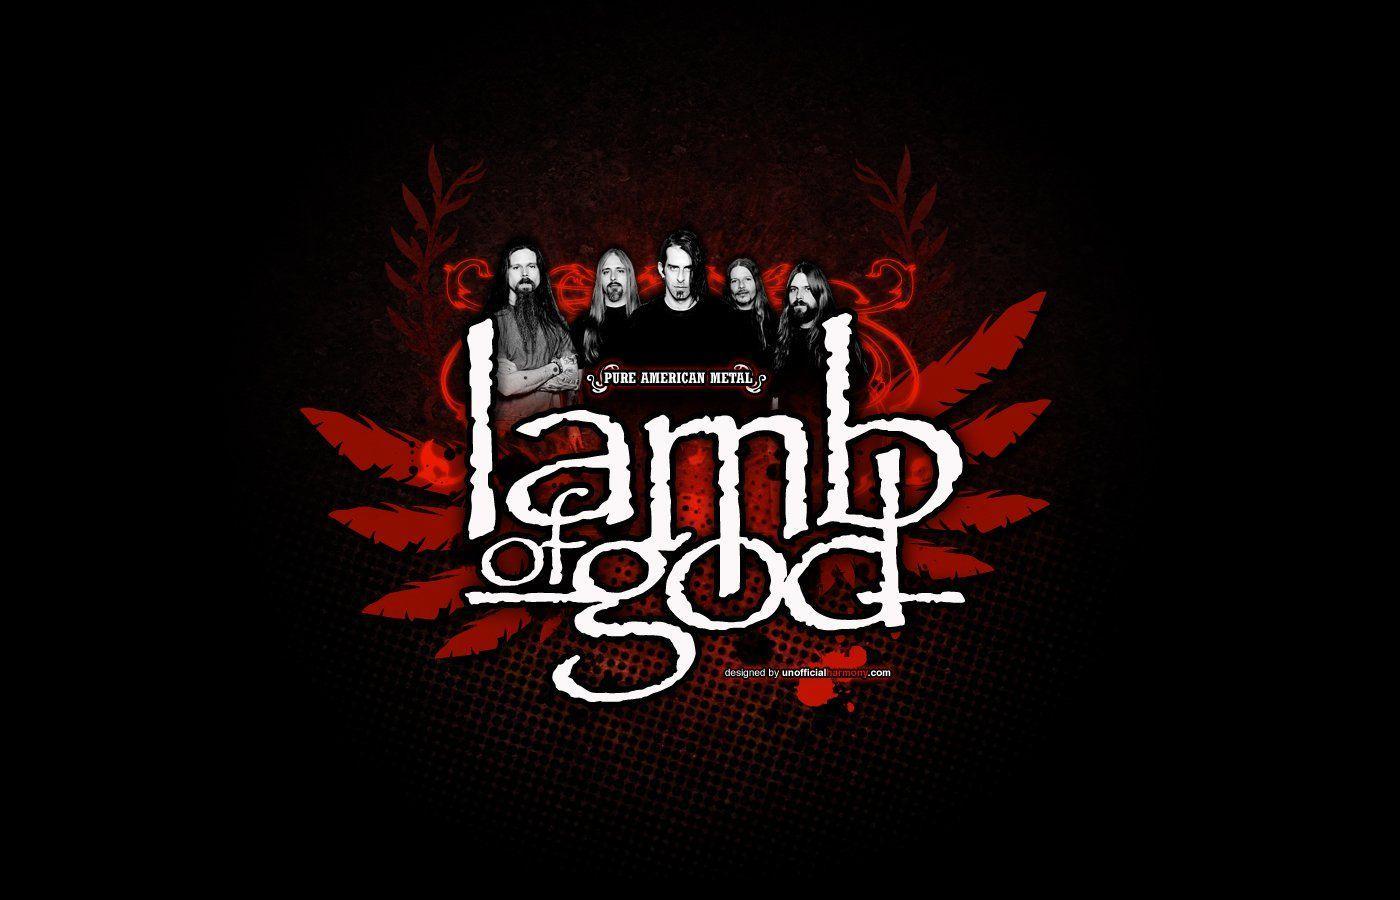 Lamb Of God Wallpapers Top Free Lamb Of God Backgrounds